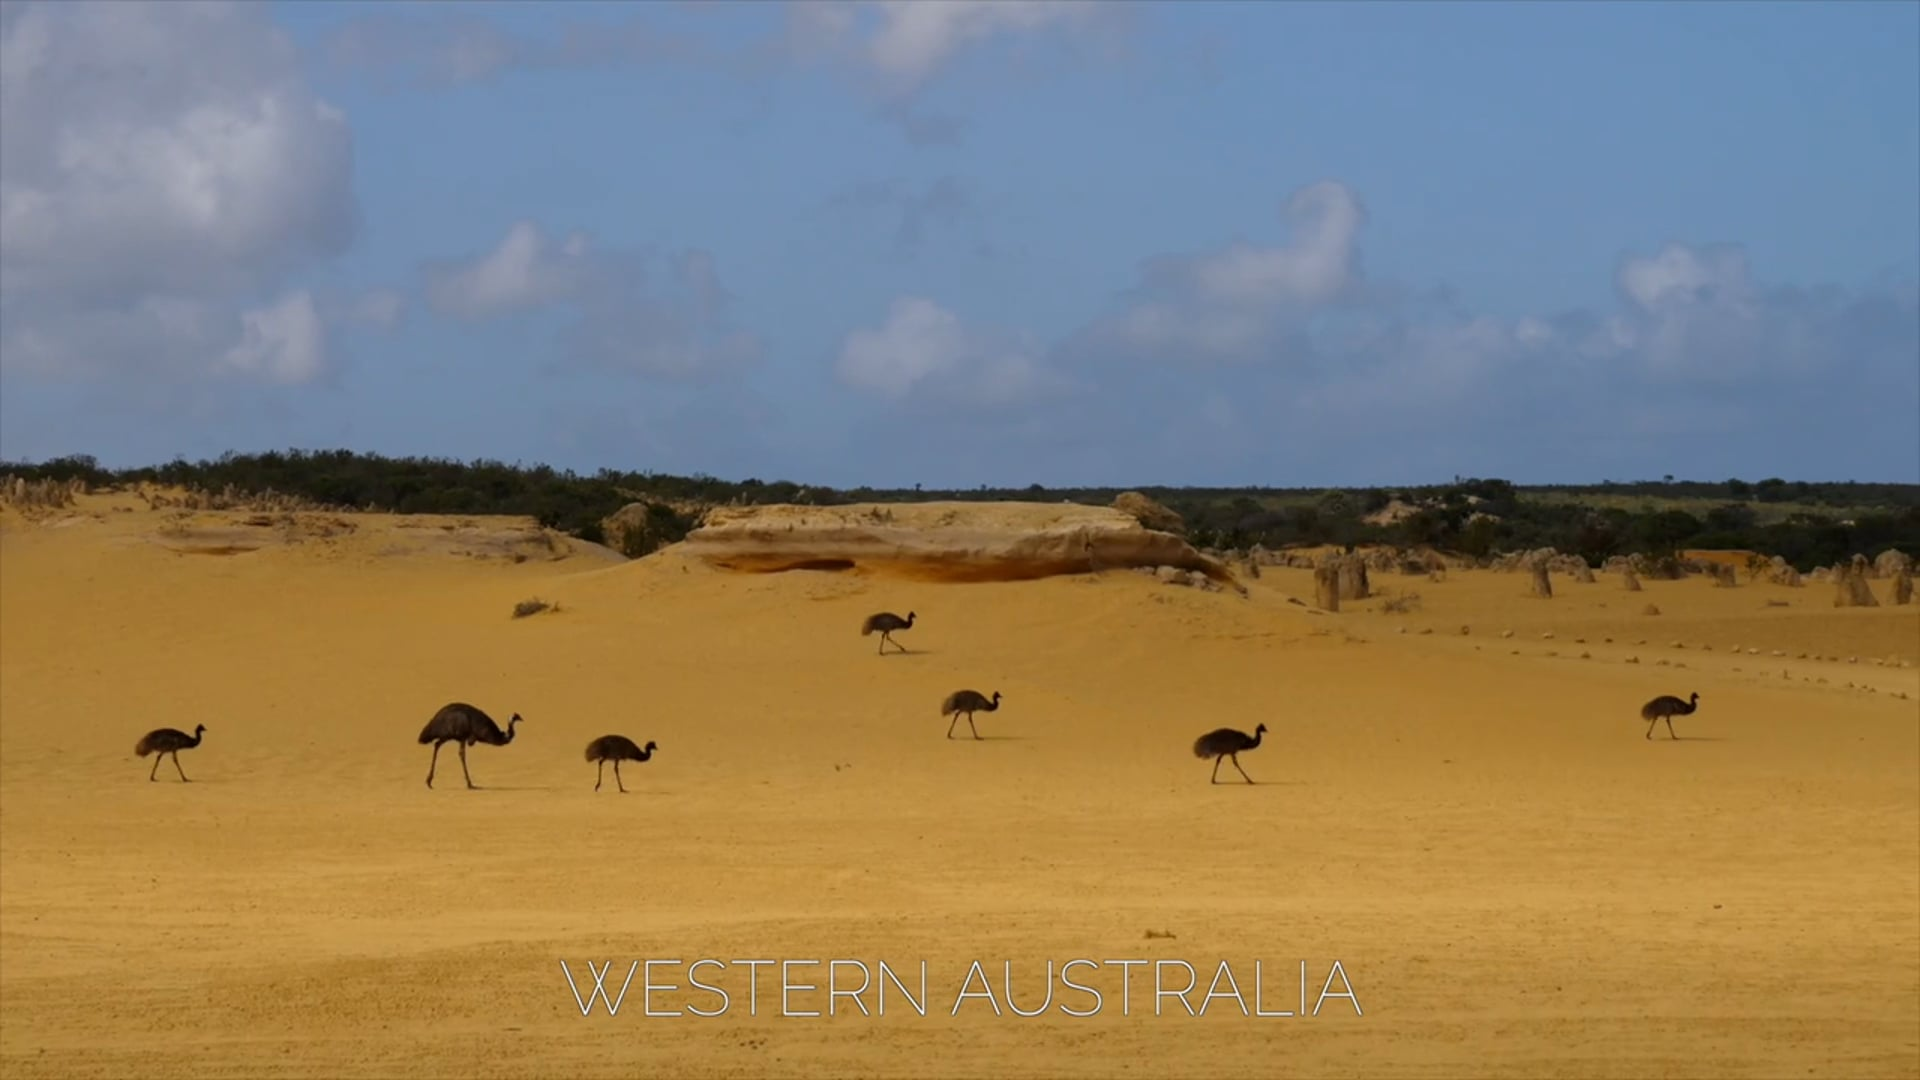 Western Australia 2020 - Federico Infantino